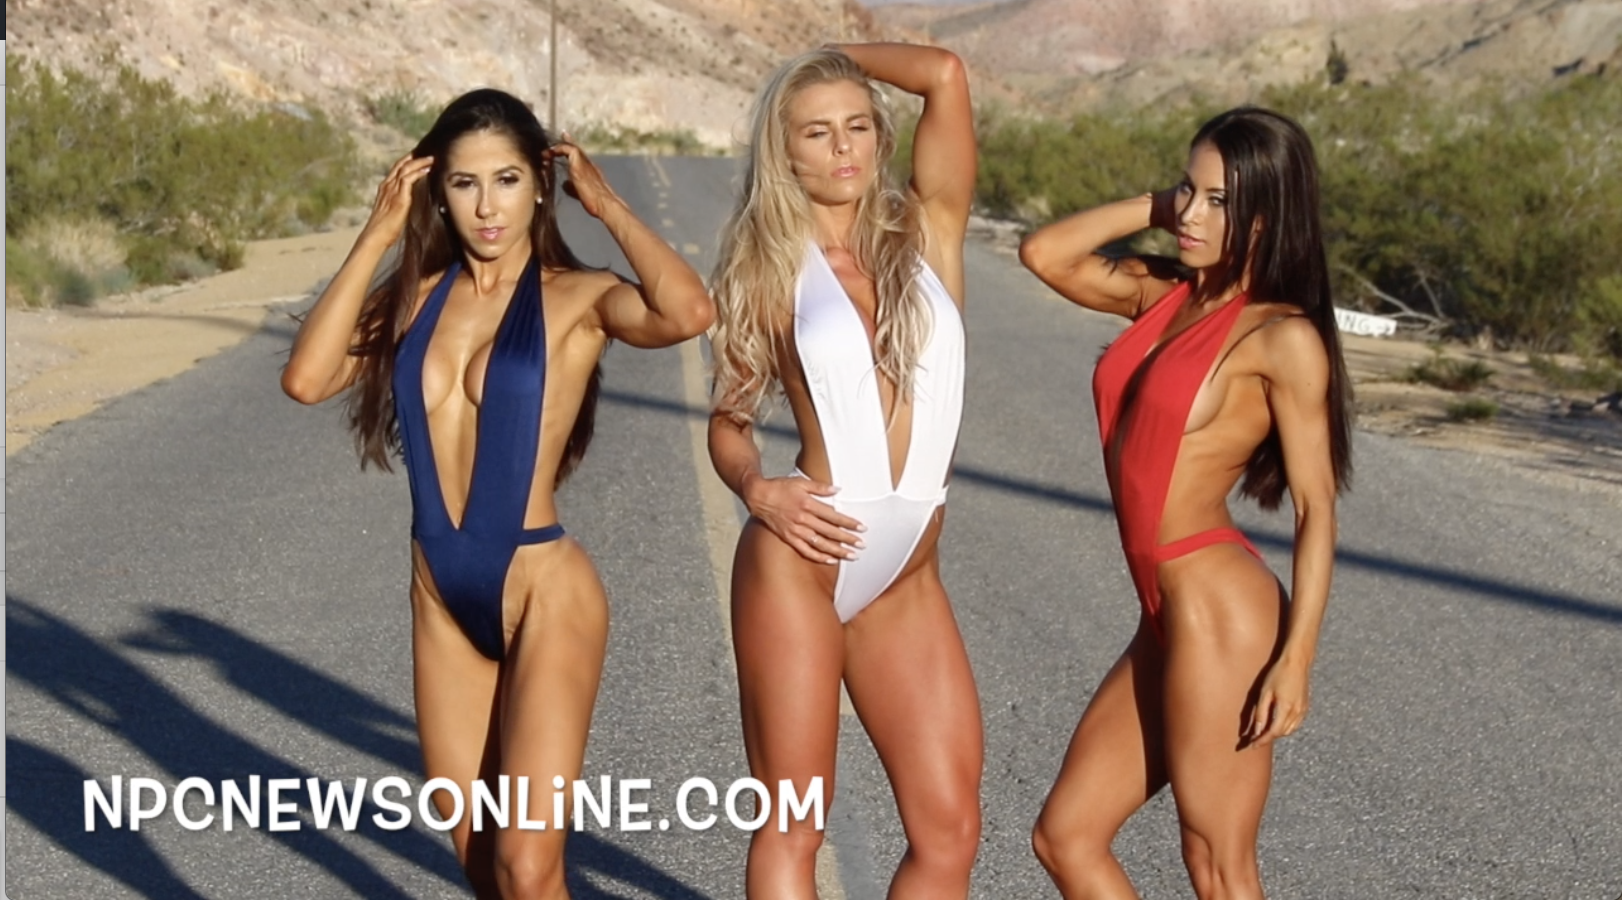 2017 J.M. Manion Nelson Ghost Town Video With IFBB Bikini Pro's Sheena Jayne Martin,  Romina Basualdo & Olympia Champion  Angelica Teixeira.